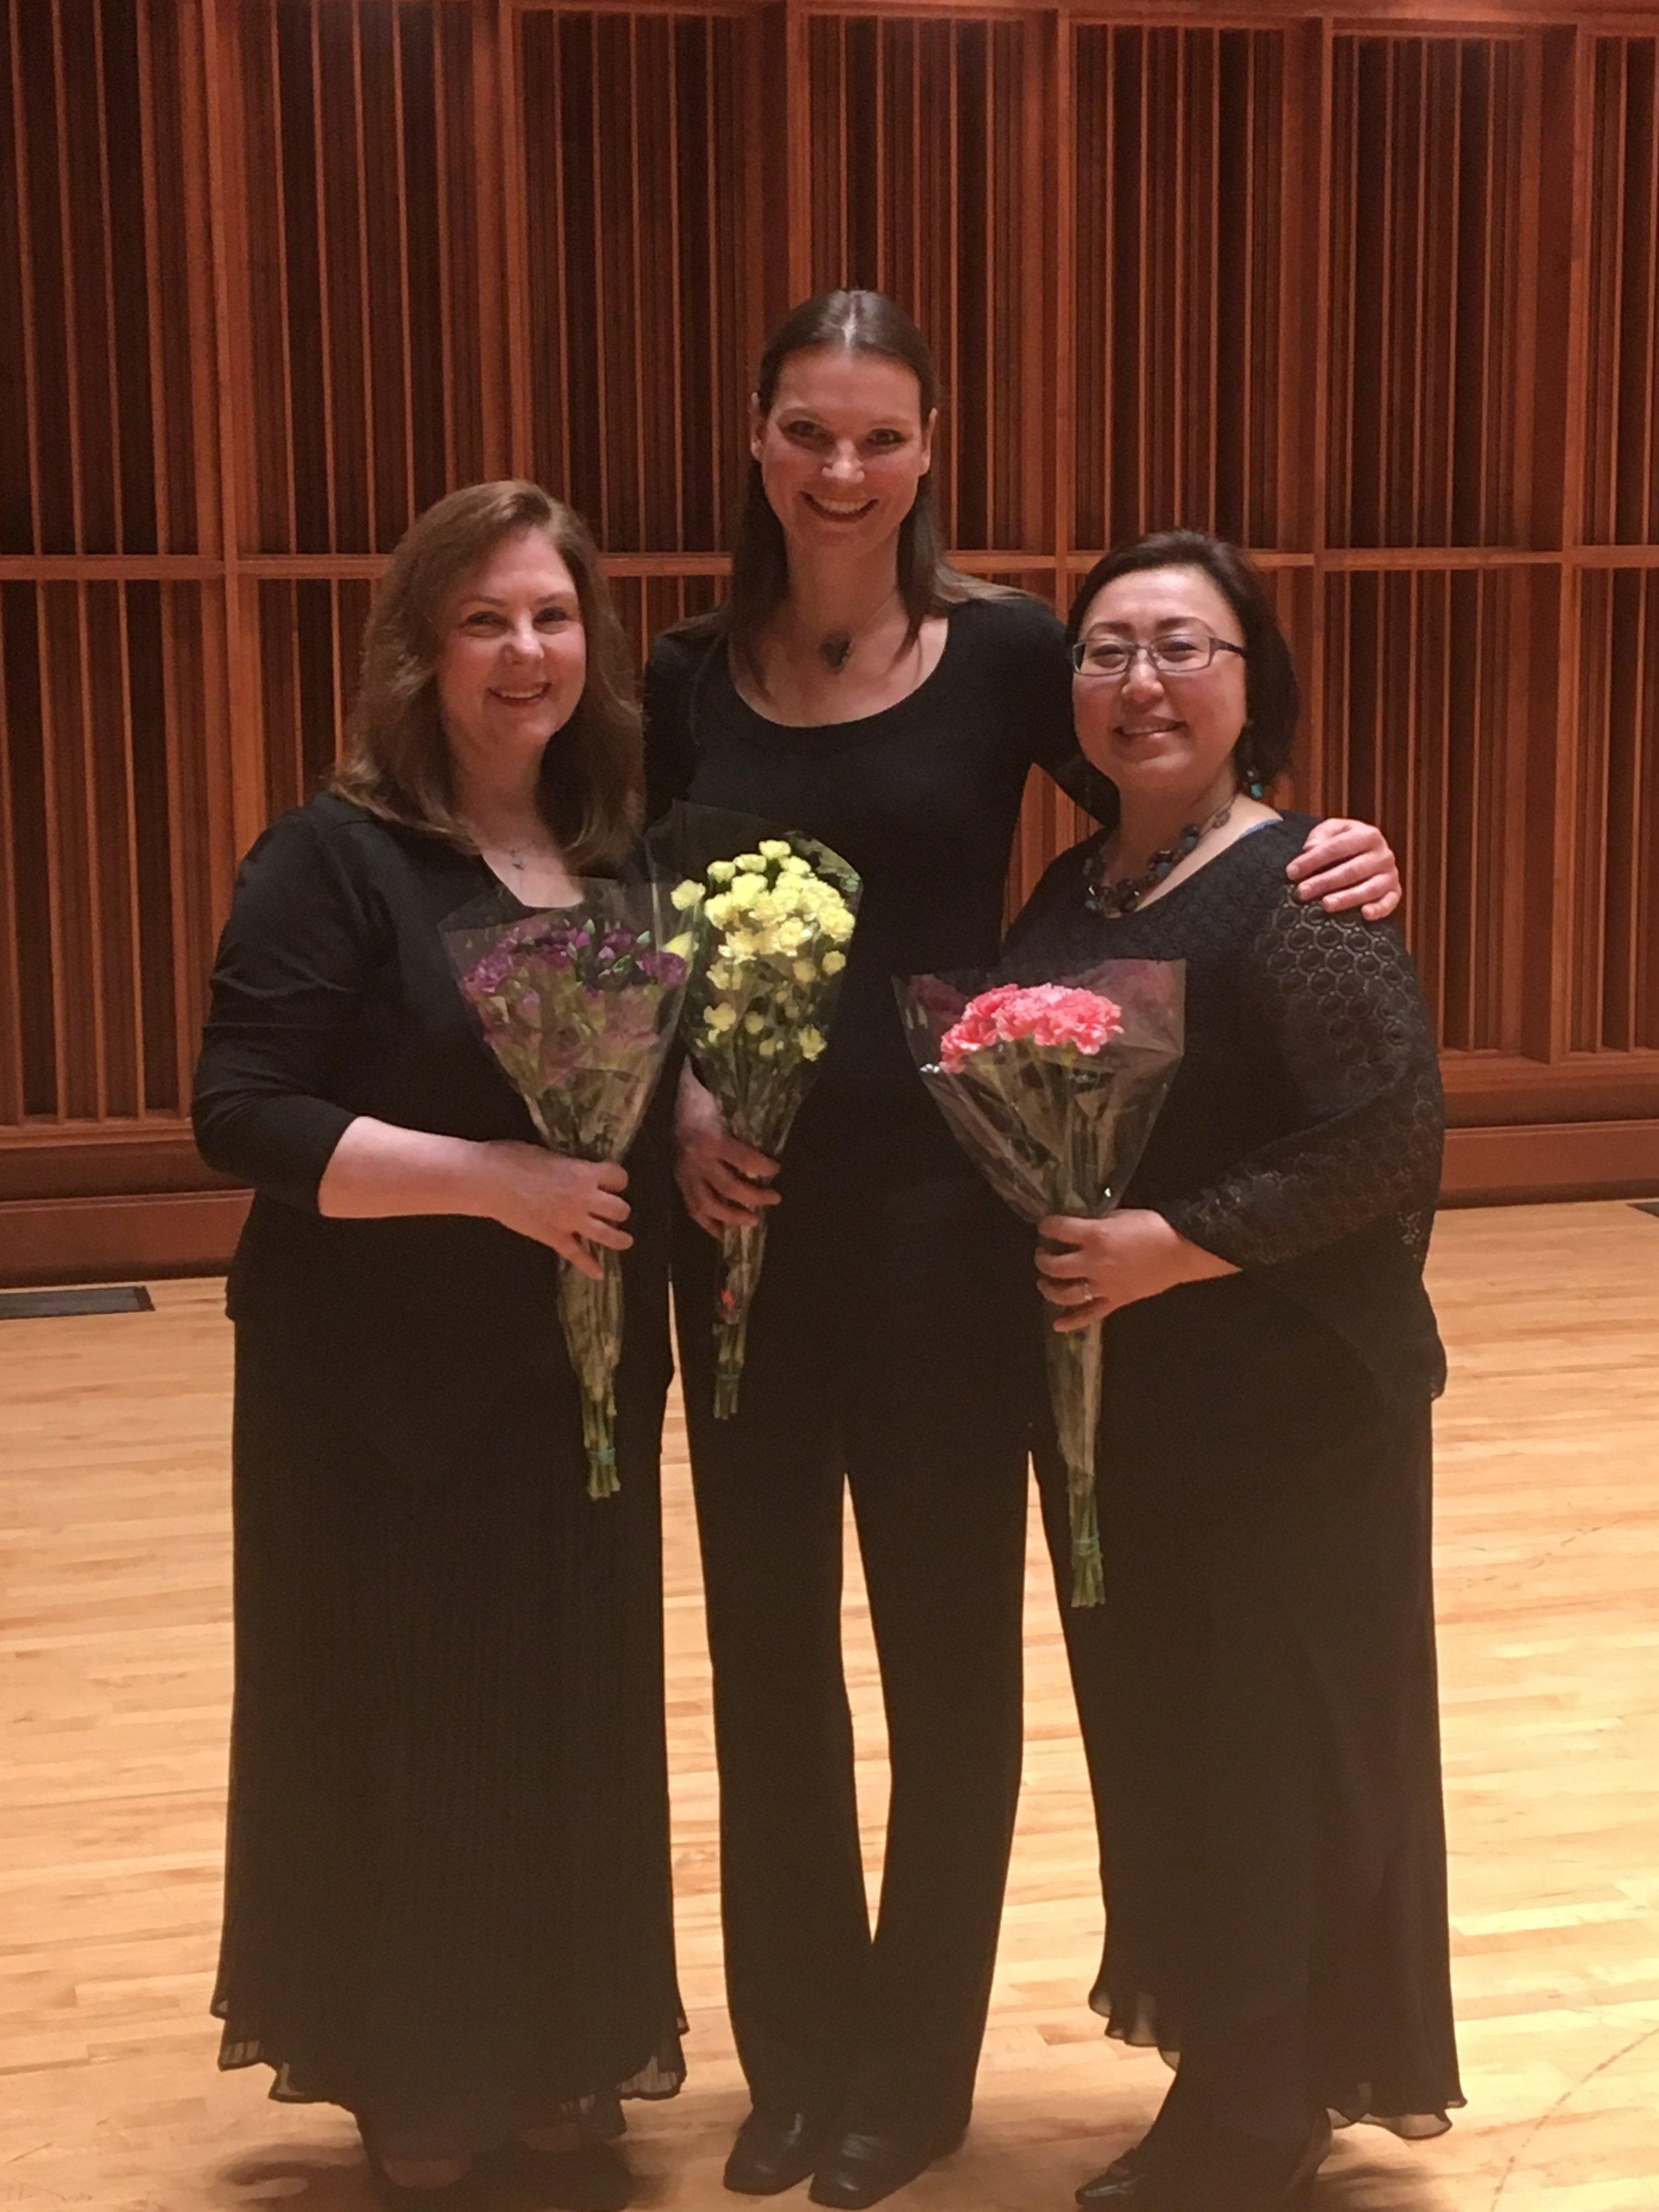 After our Hibiki Trio recital. The harp studio brought us flowers!